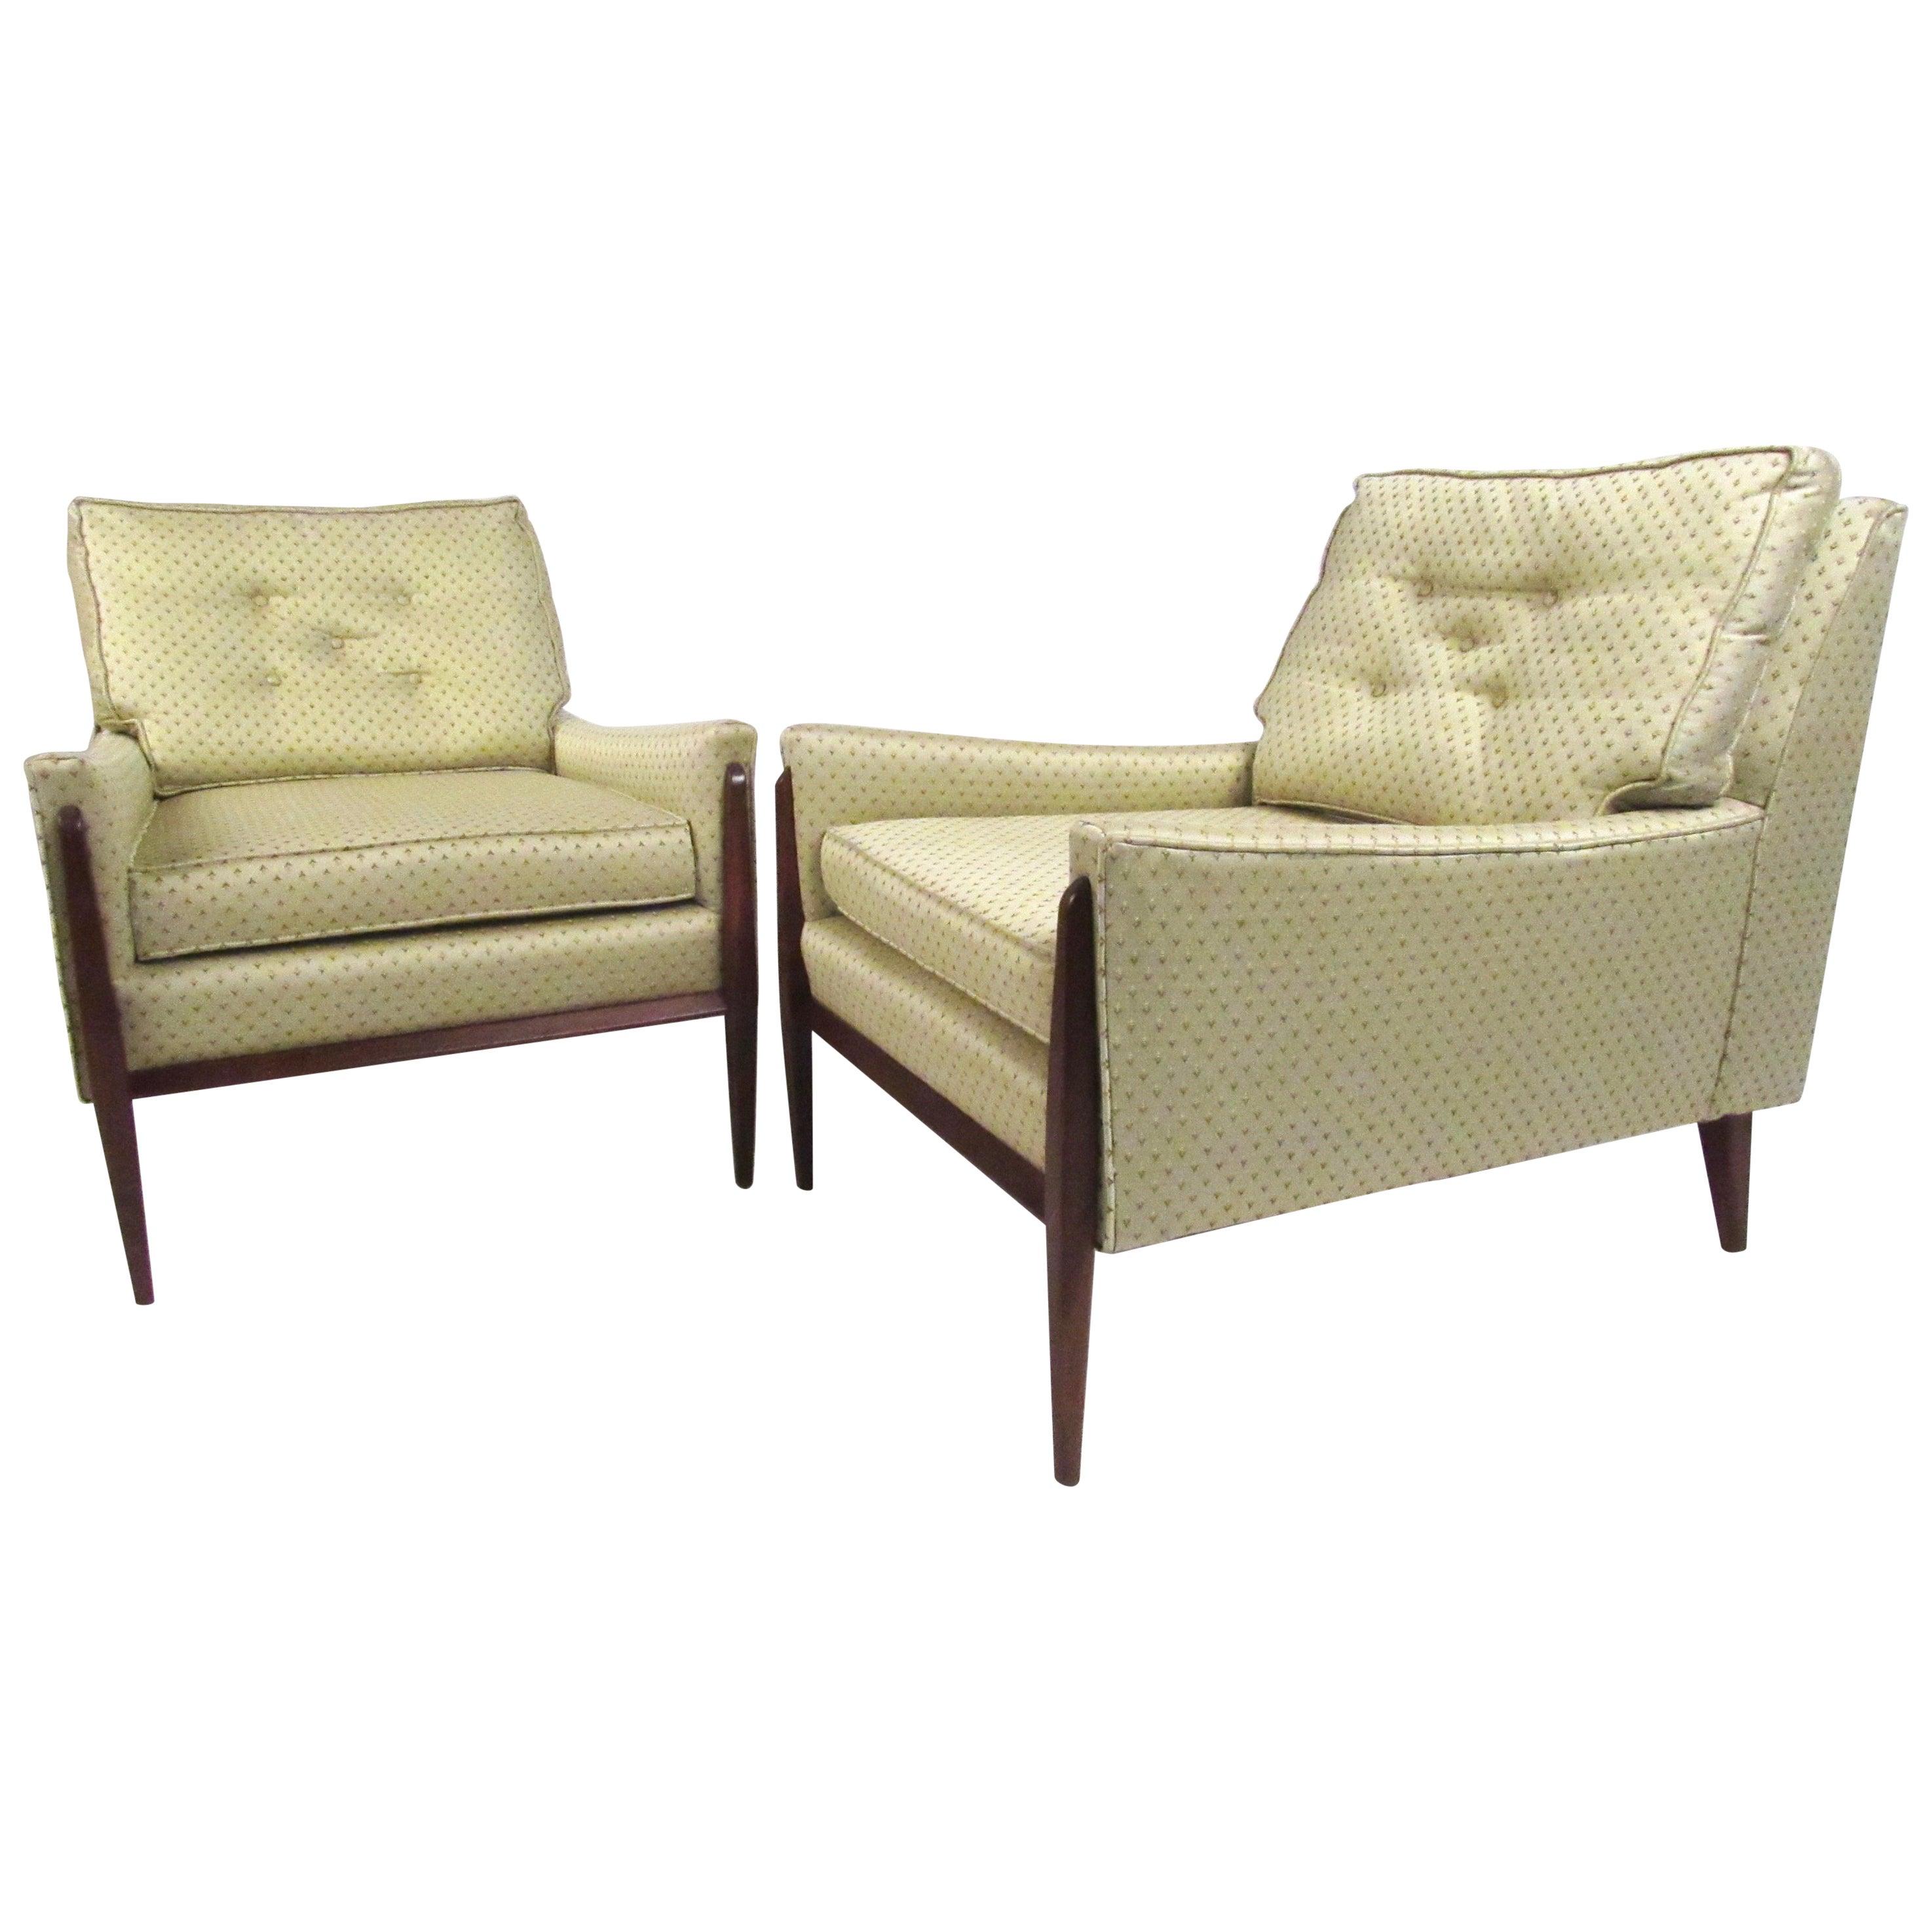 Stylish Pair of Mid-Century Modern Paul McCobb Style Lounge Chairs